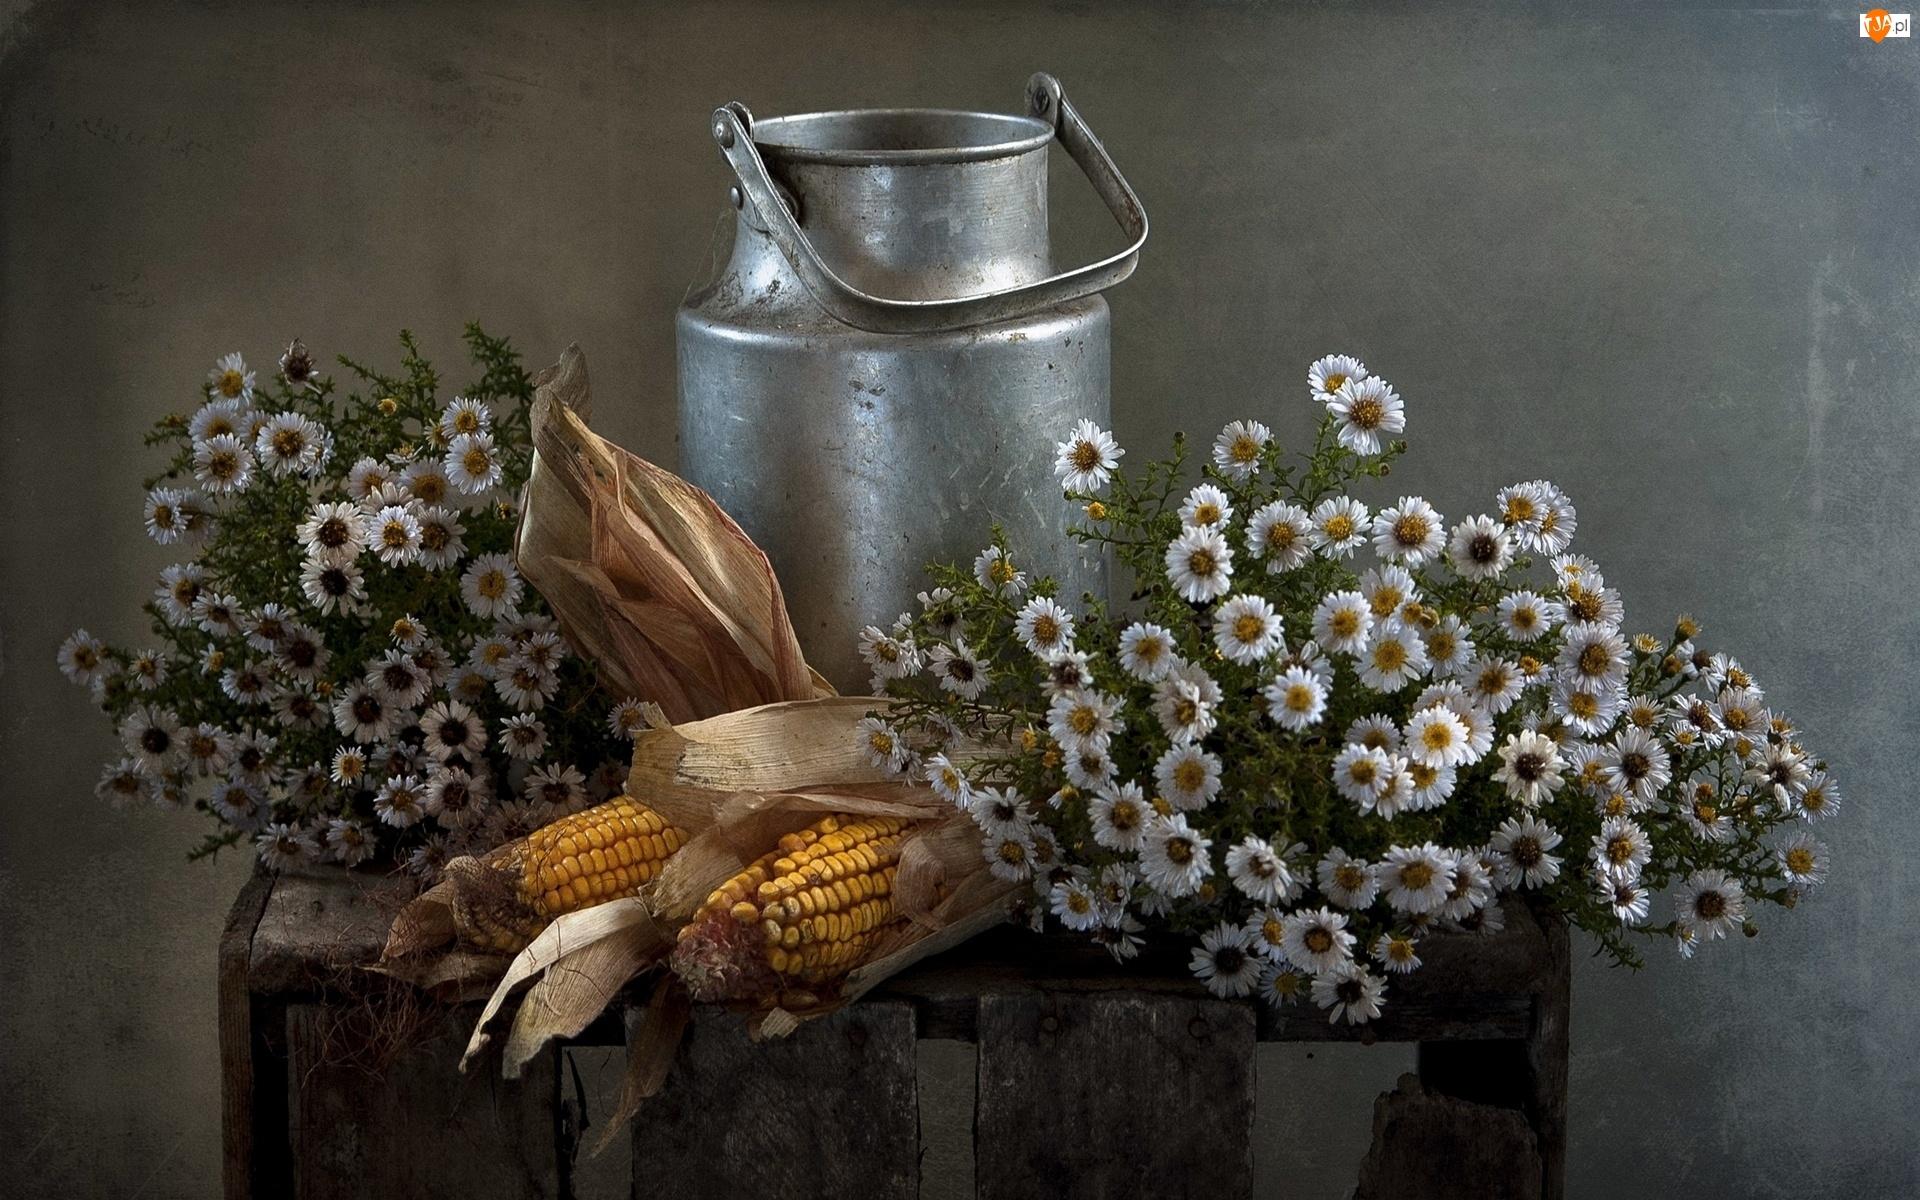 Kompozycja, Bańka, Kwiaty, Kukurydza